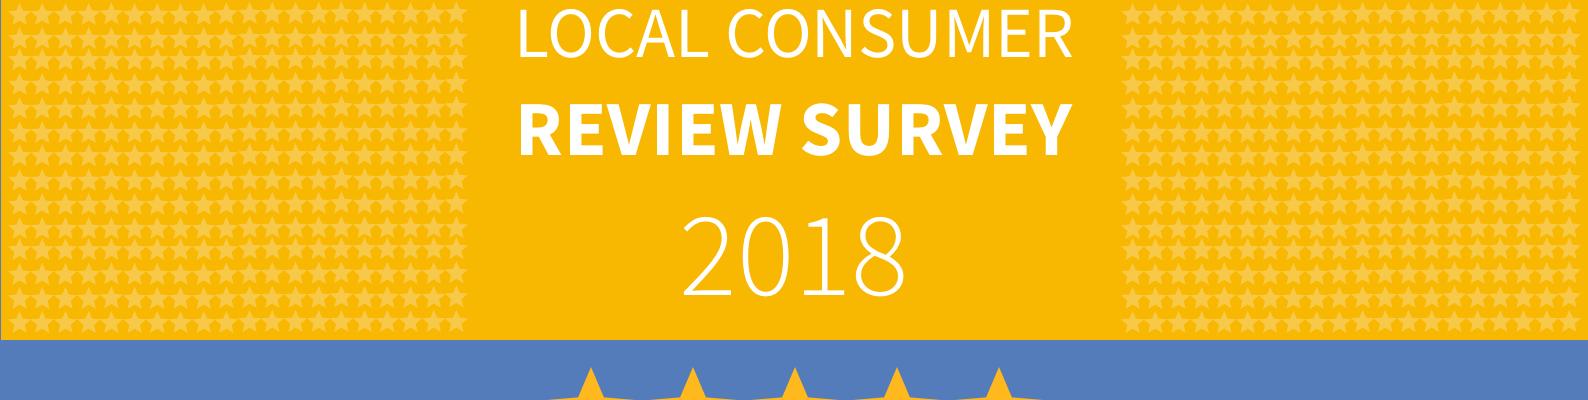 Local Consumer Review Survey 2018 Header2